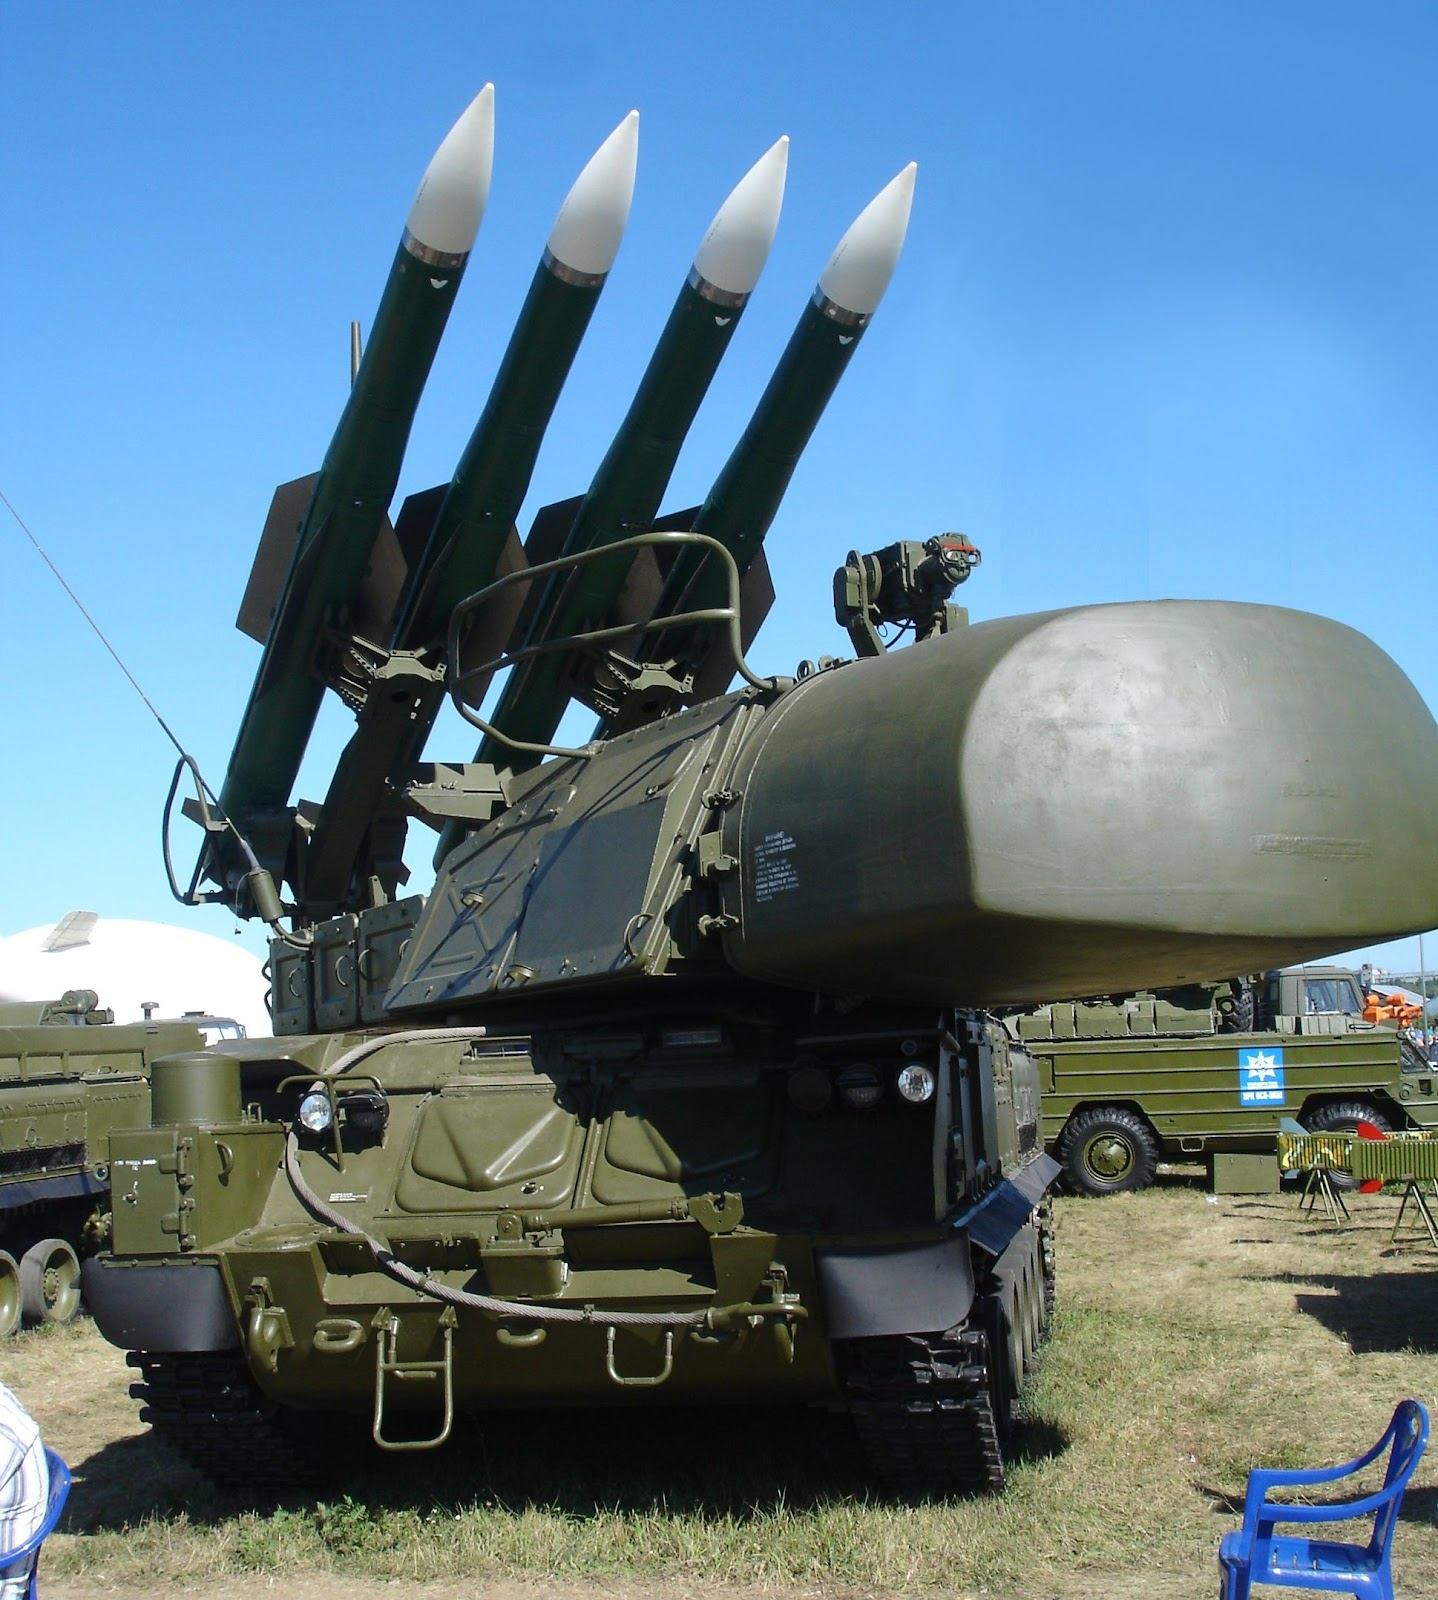 Naval Open Source INTelligence: Russia Develops 'Microwave